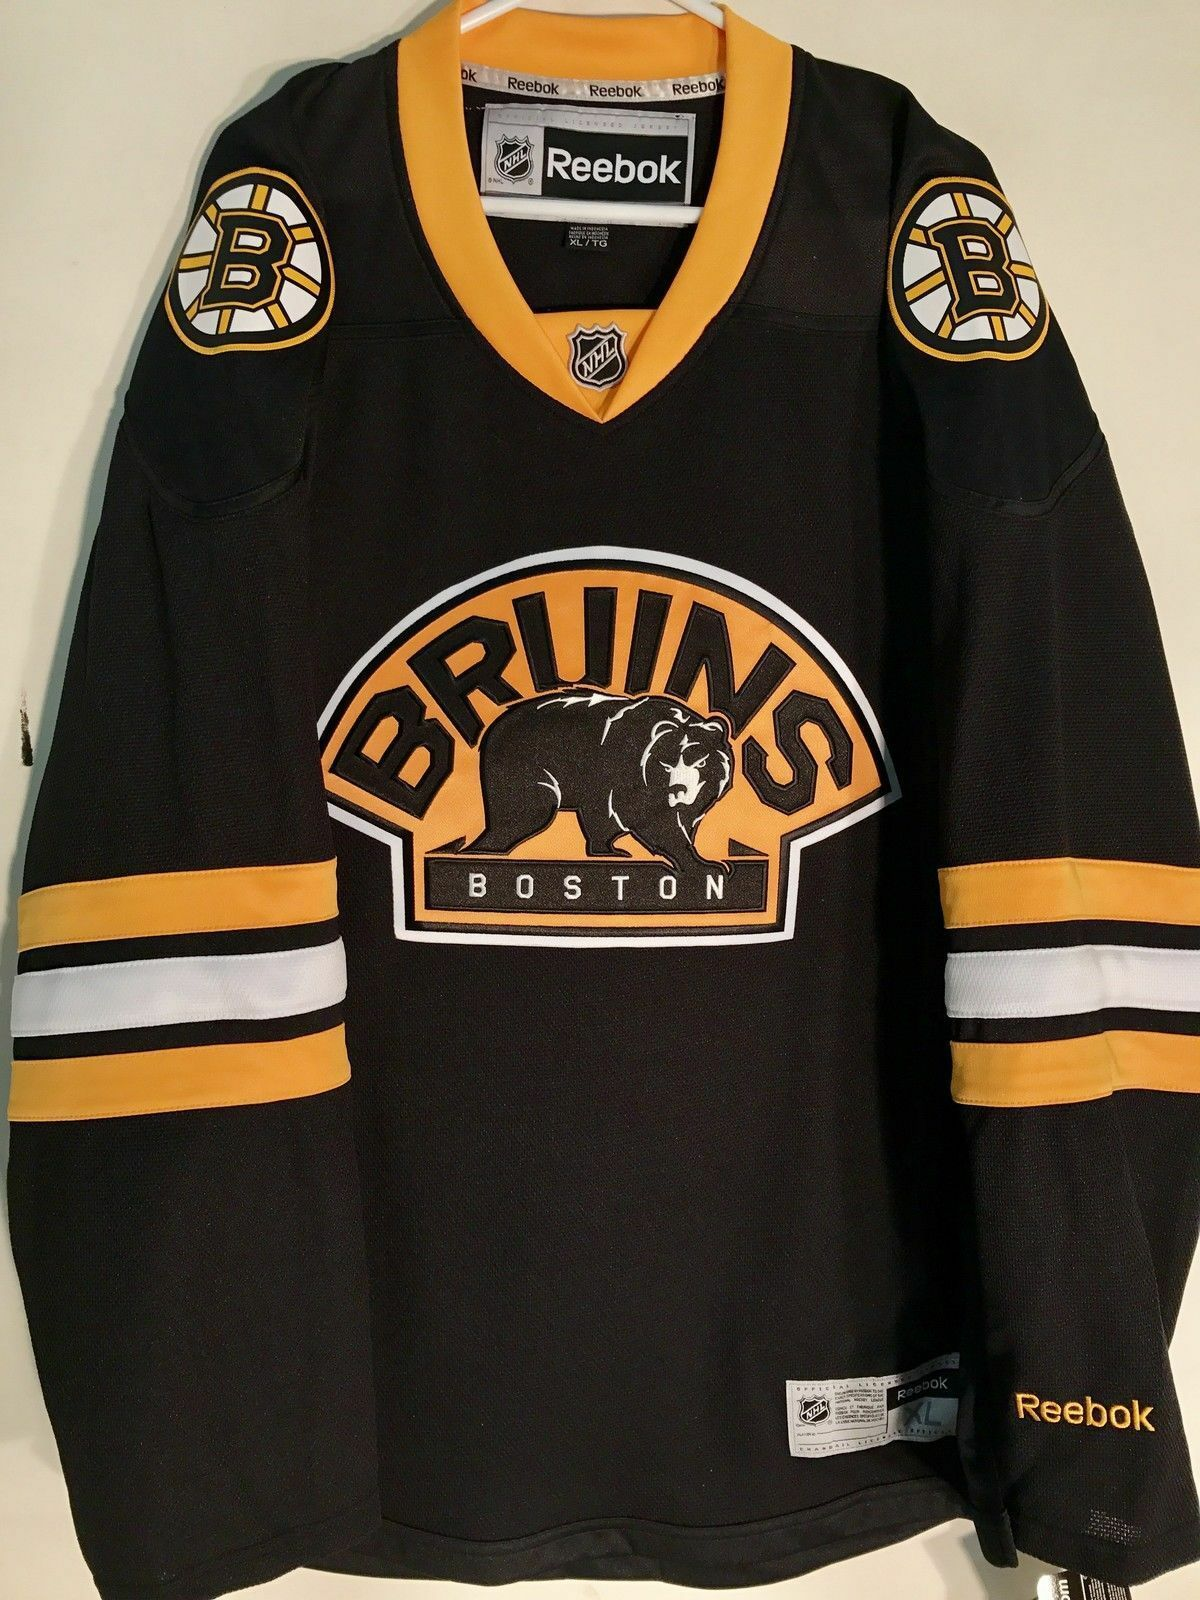 designer fashion 1cd22 35d04 Details about NHL Boston Bruins Alternate Premier Ice Hockey ...